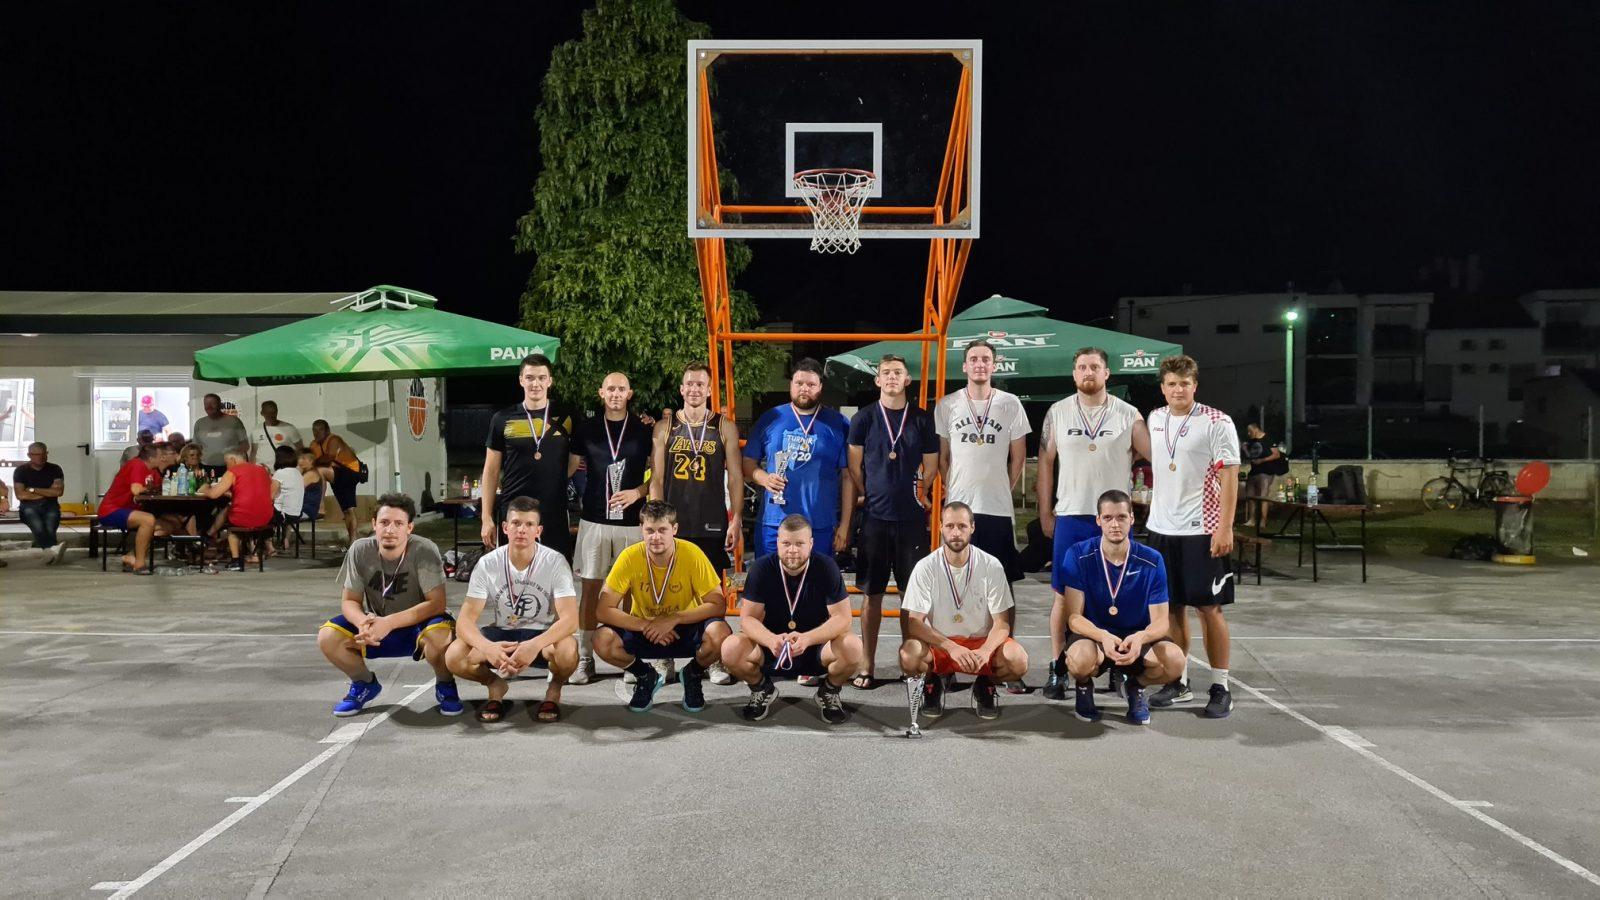 1. prvenstvo Međimurja u streetball-u 5